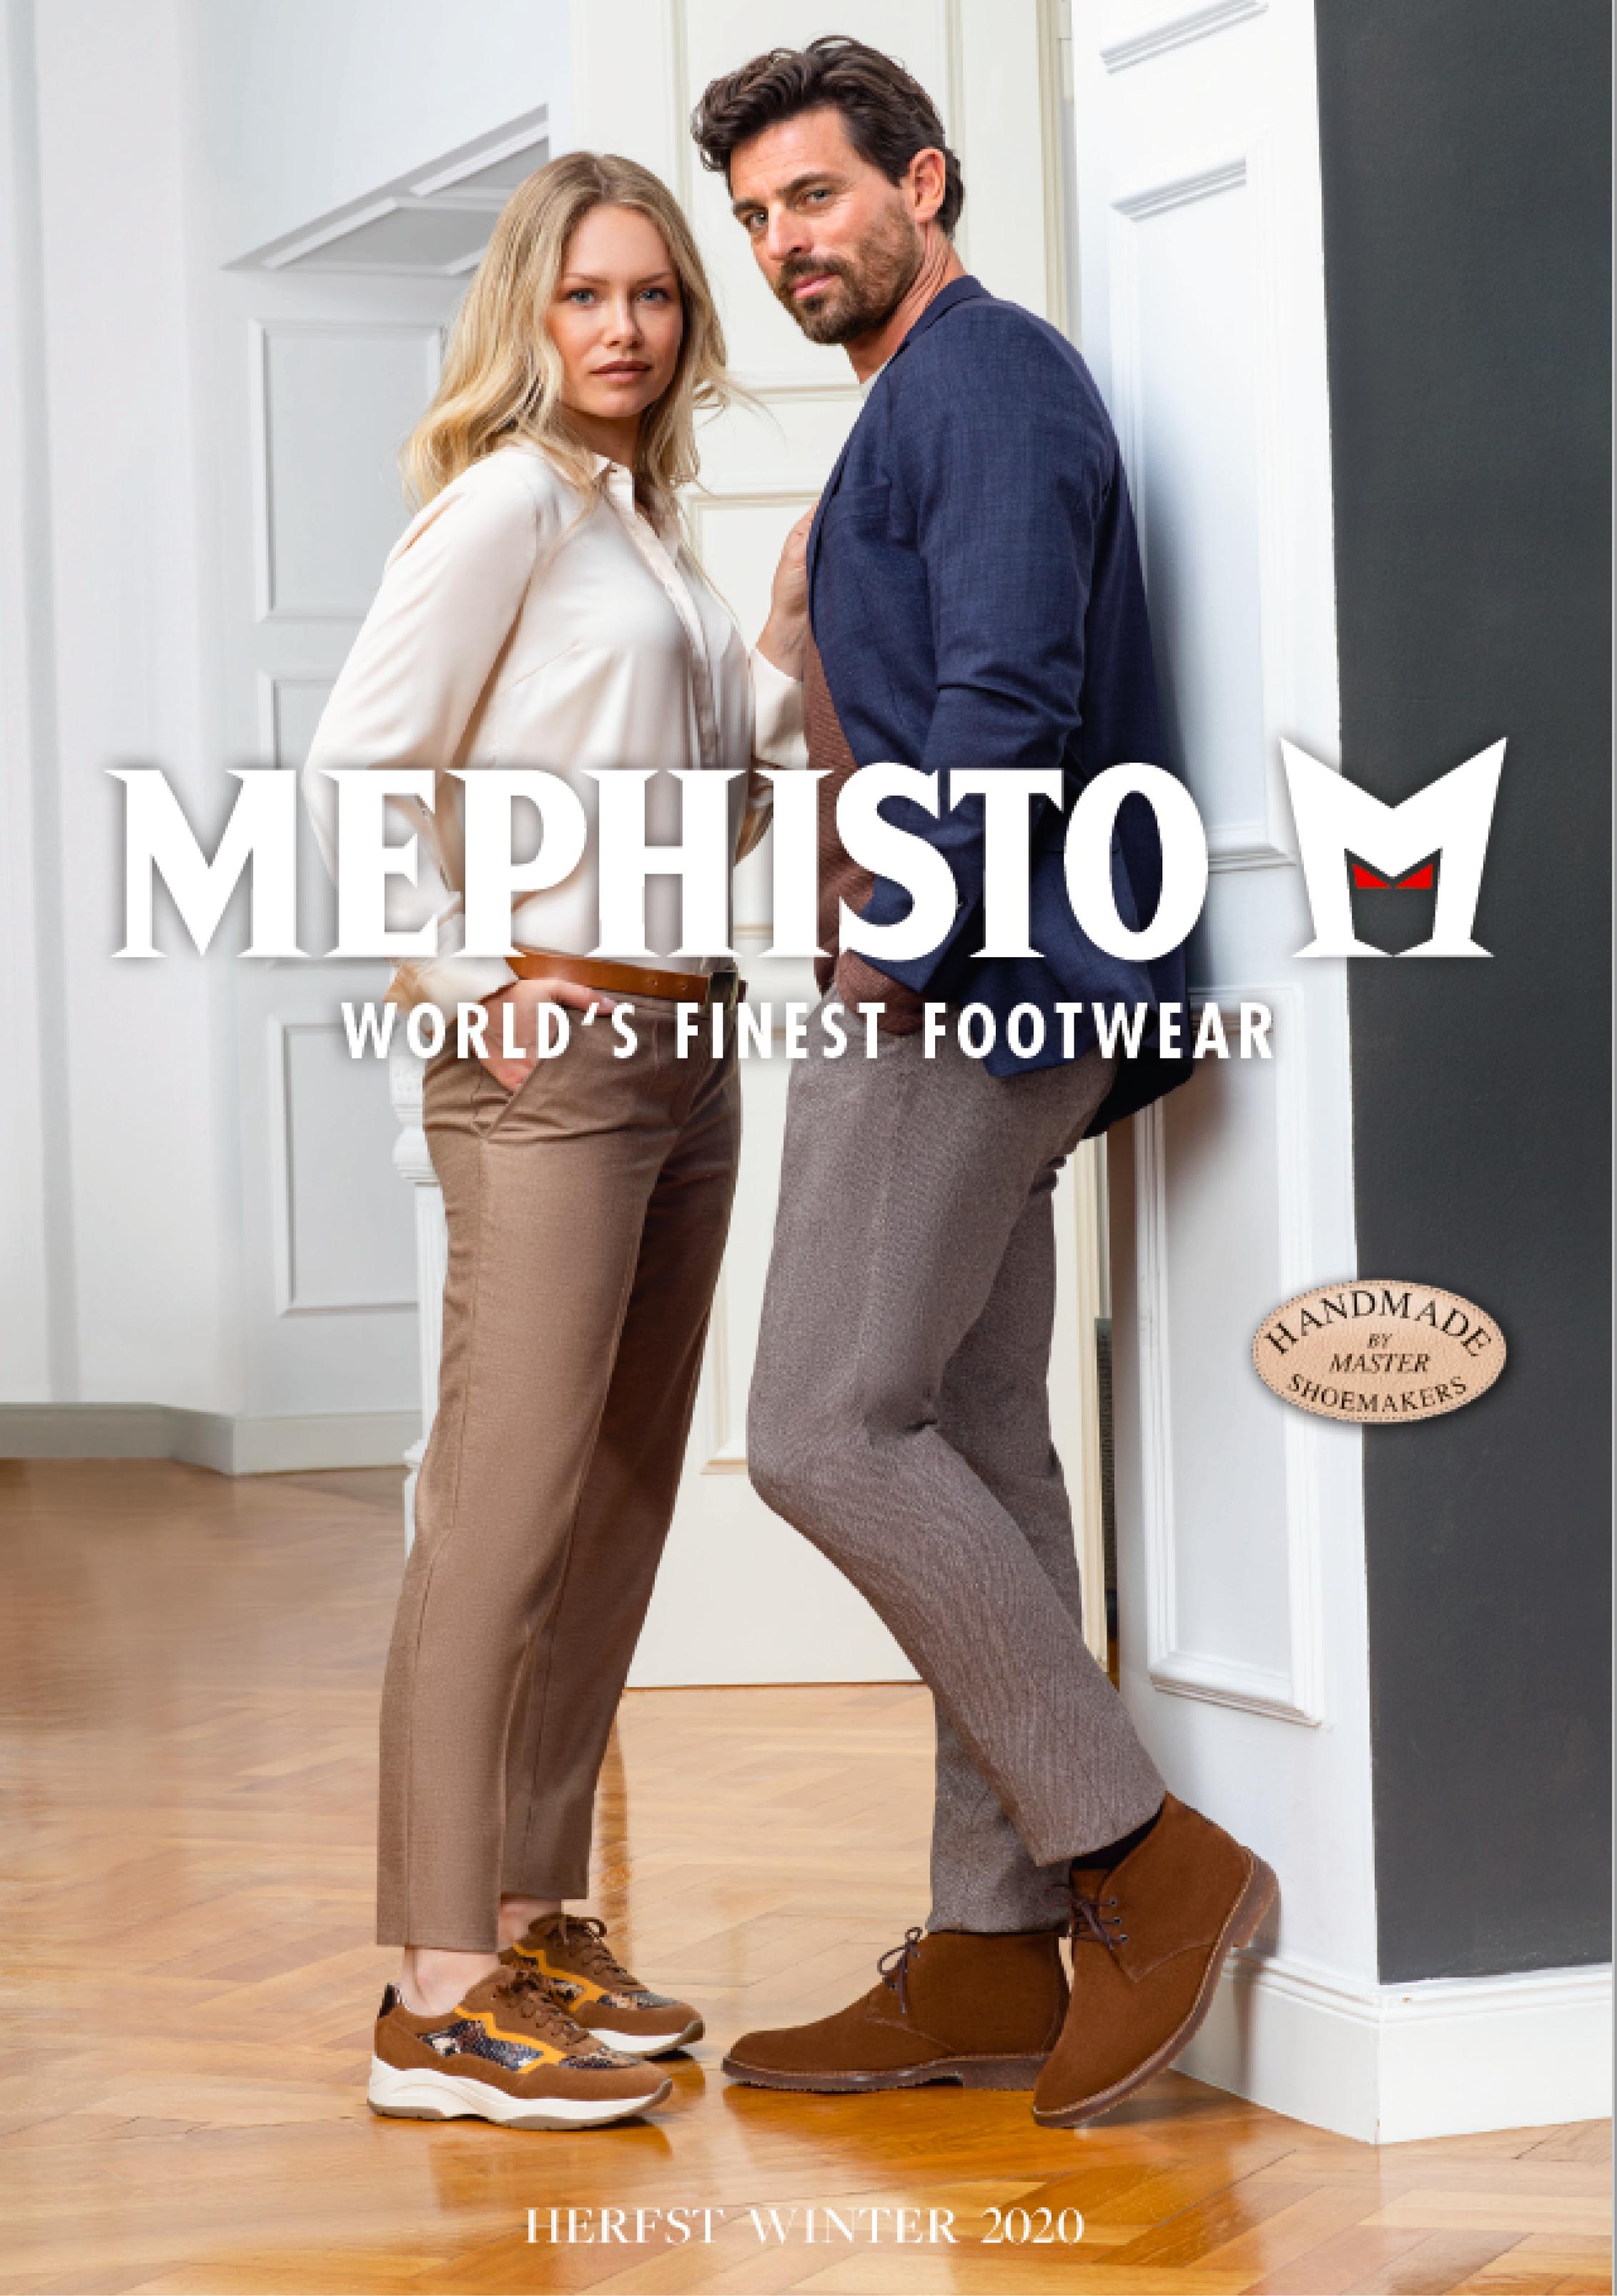 voorpagina mephisto folder najaar 2020